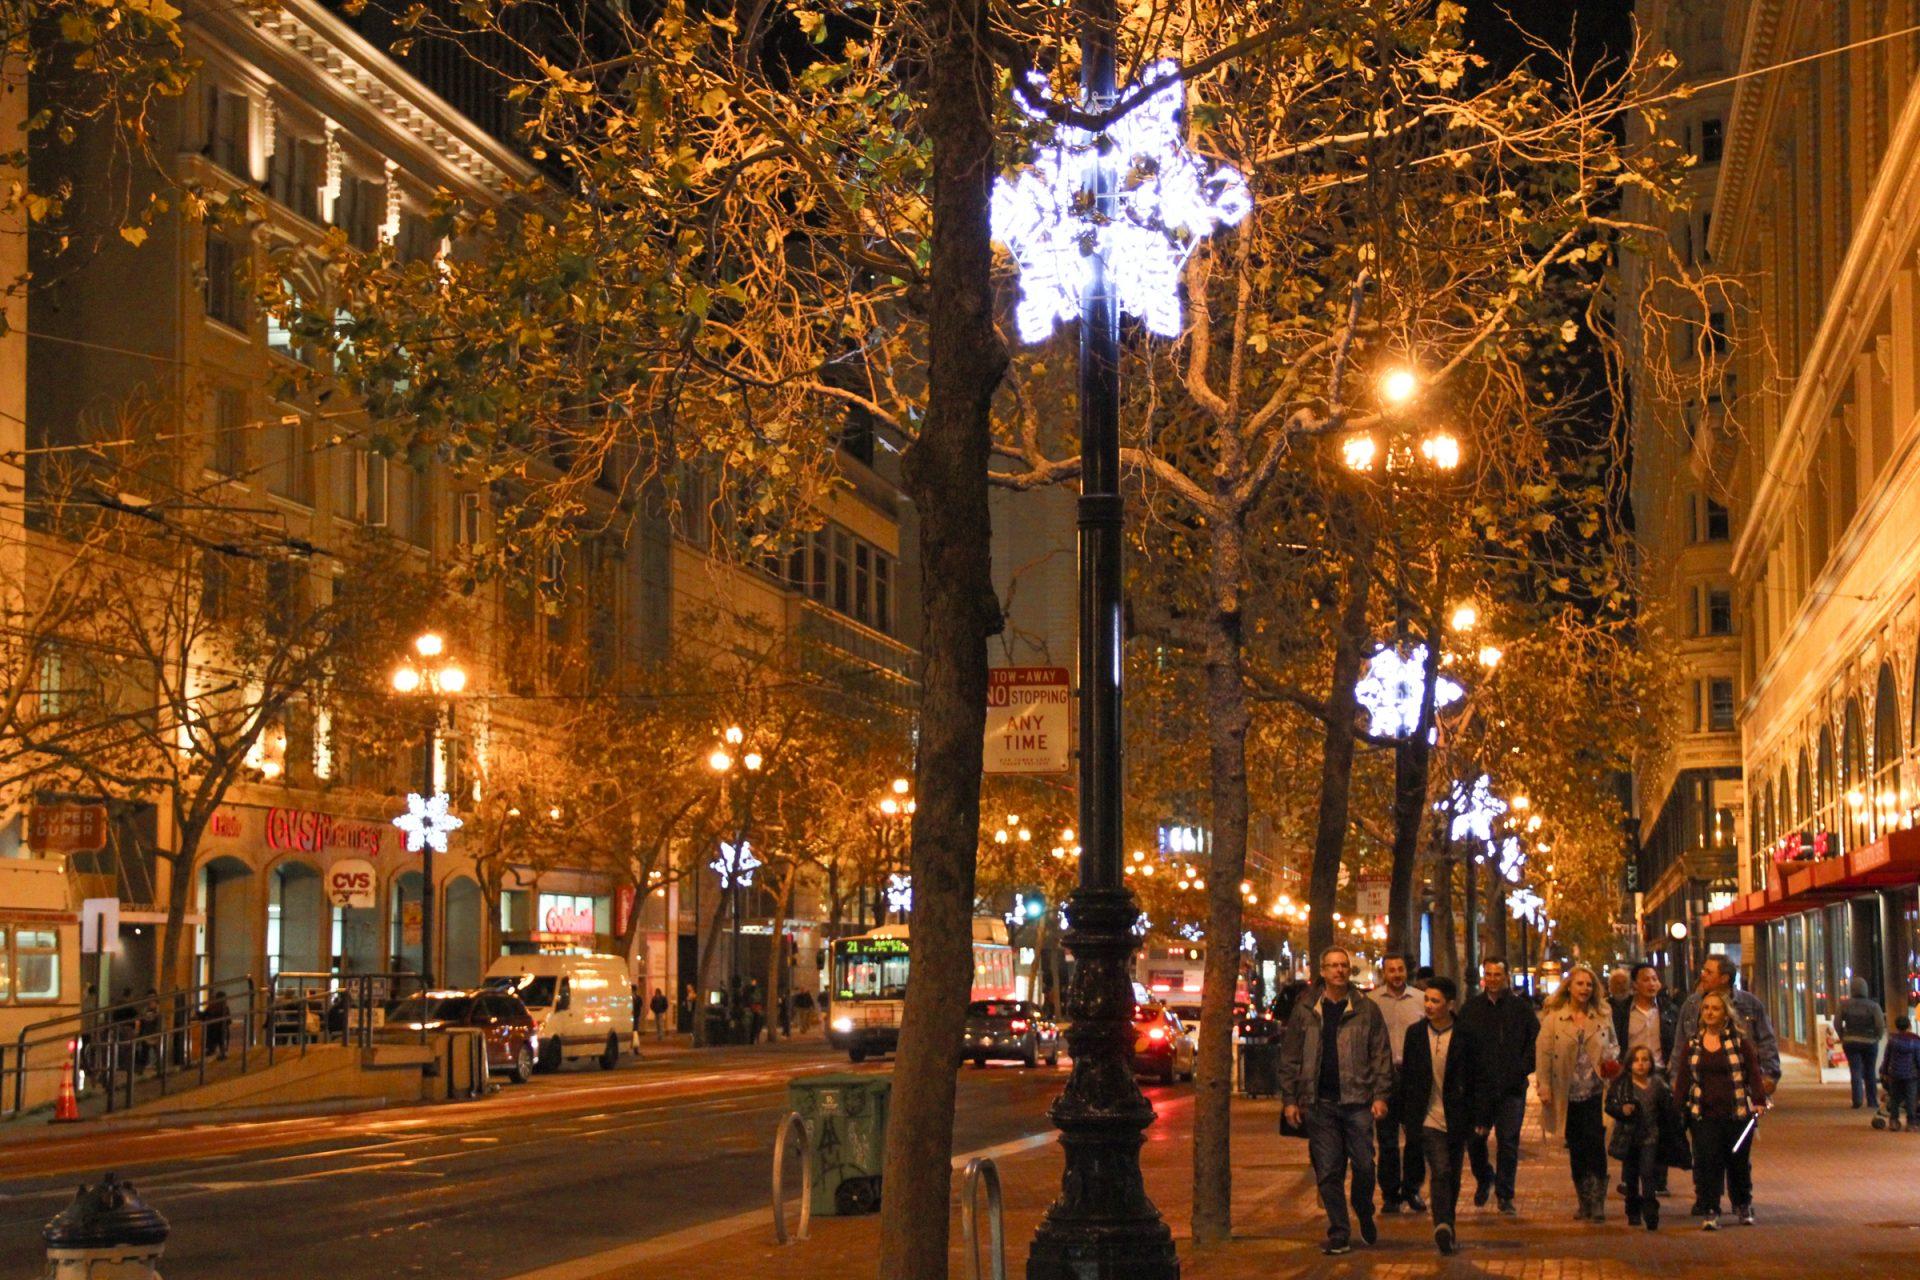 Free Stock Photo of People Walking Down City Street at Night